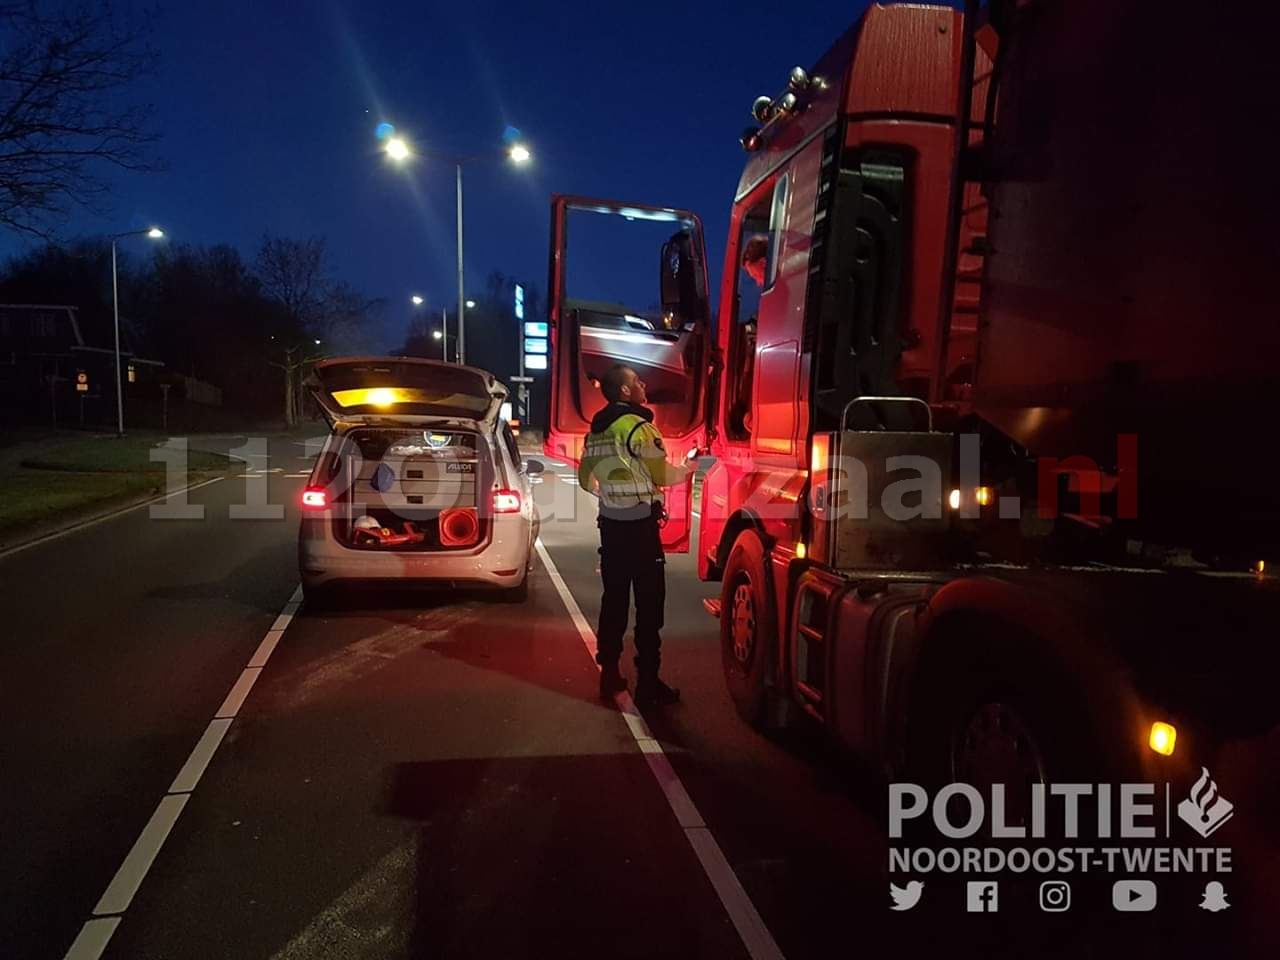 Politie houdt alcoholcontrole in Oldenzaal